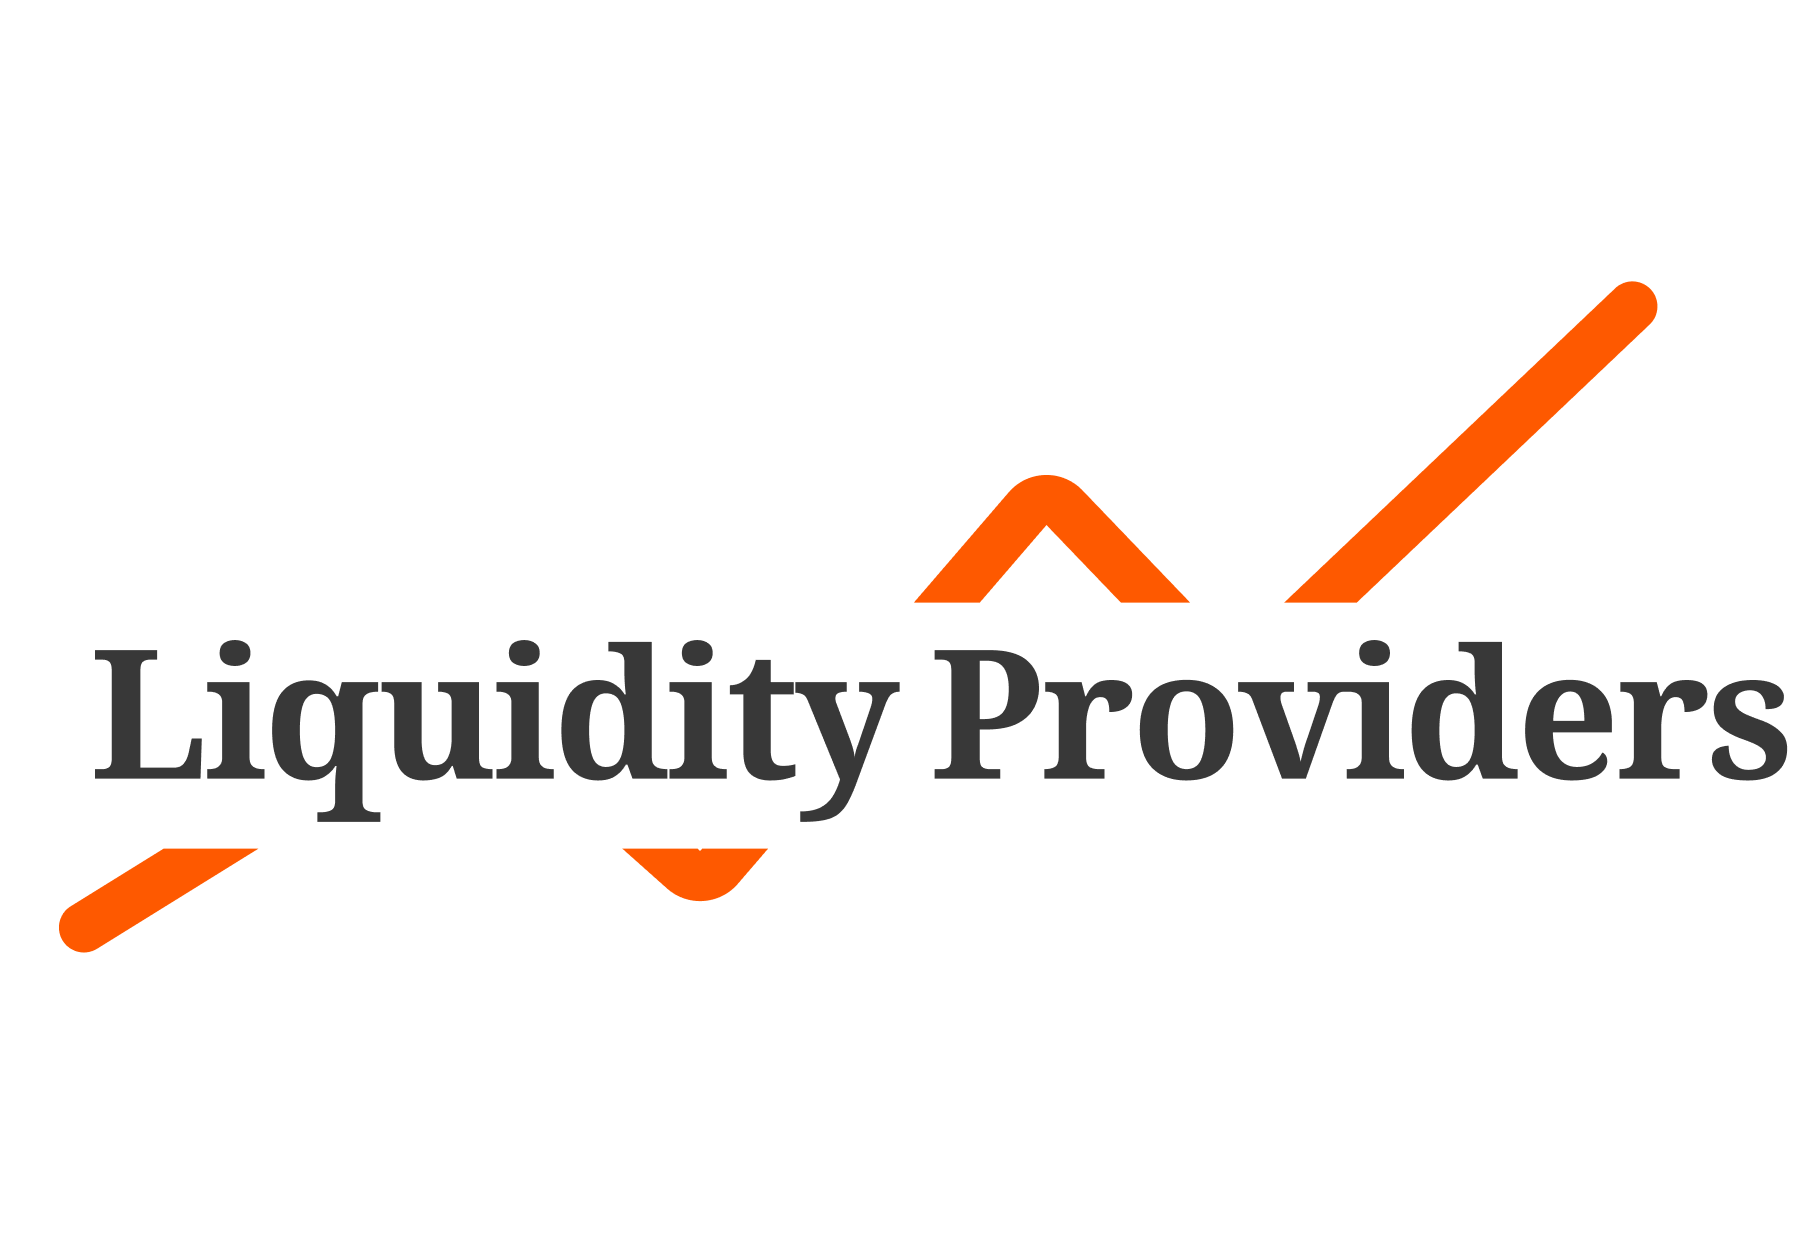 liquidity provider logo